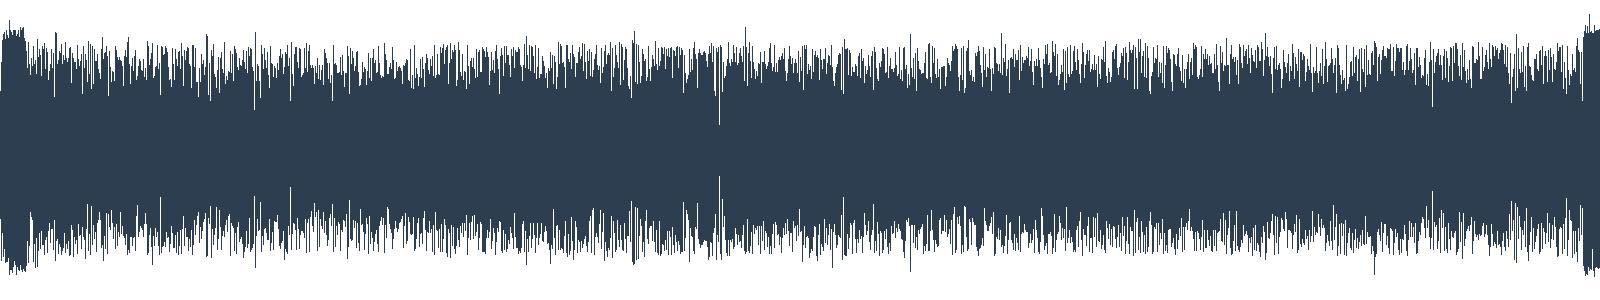 Eko vajcia waveform